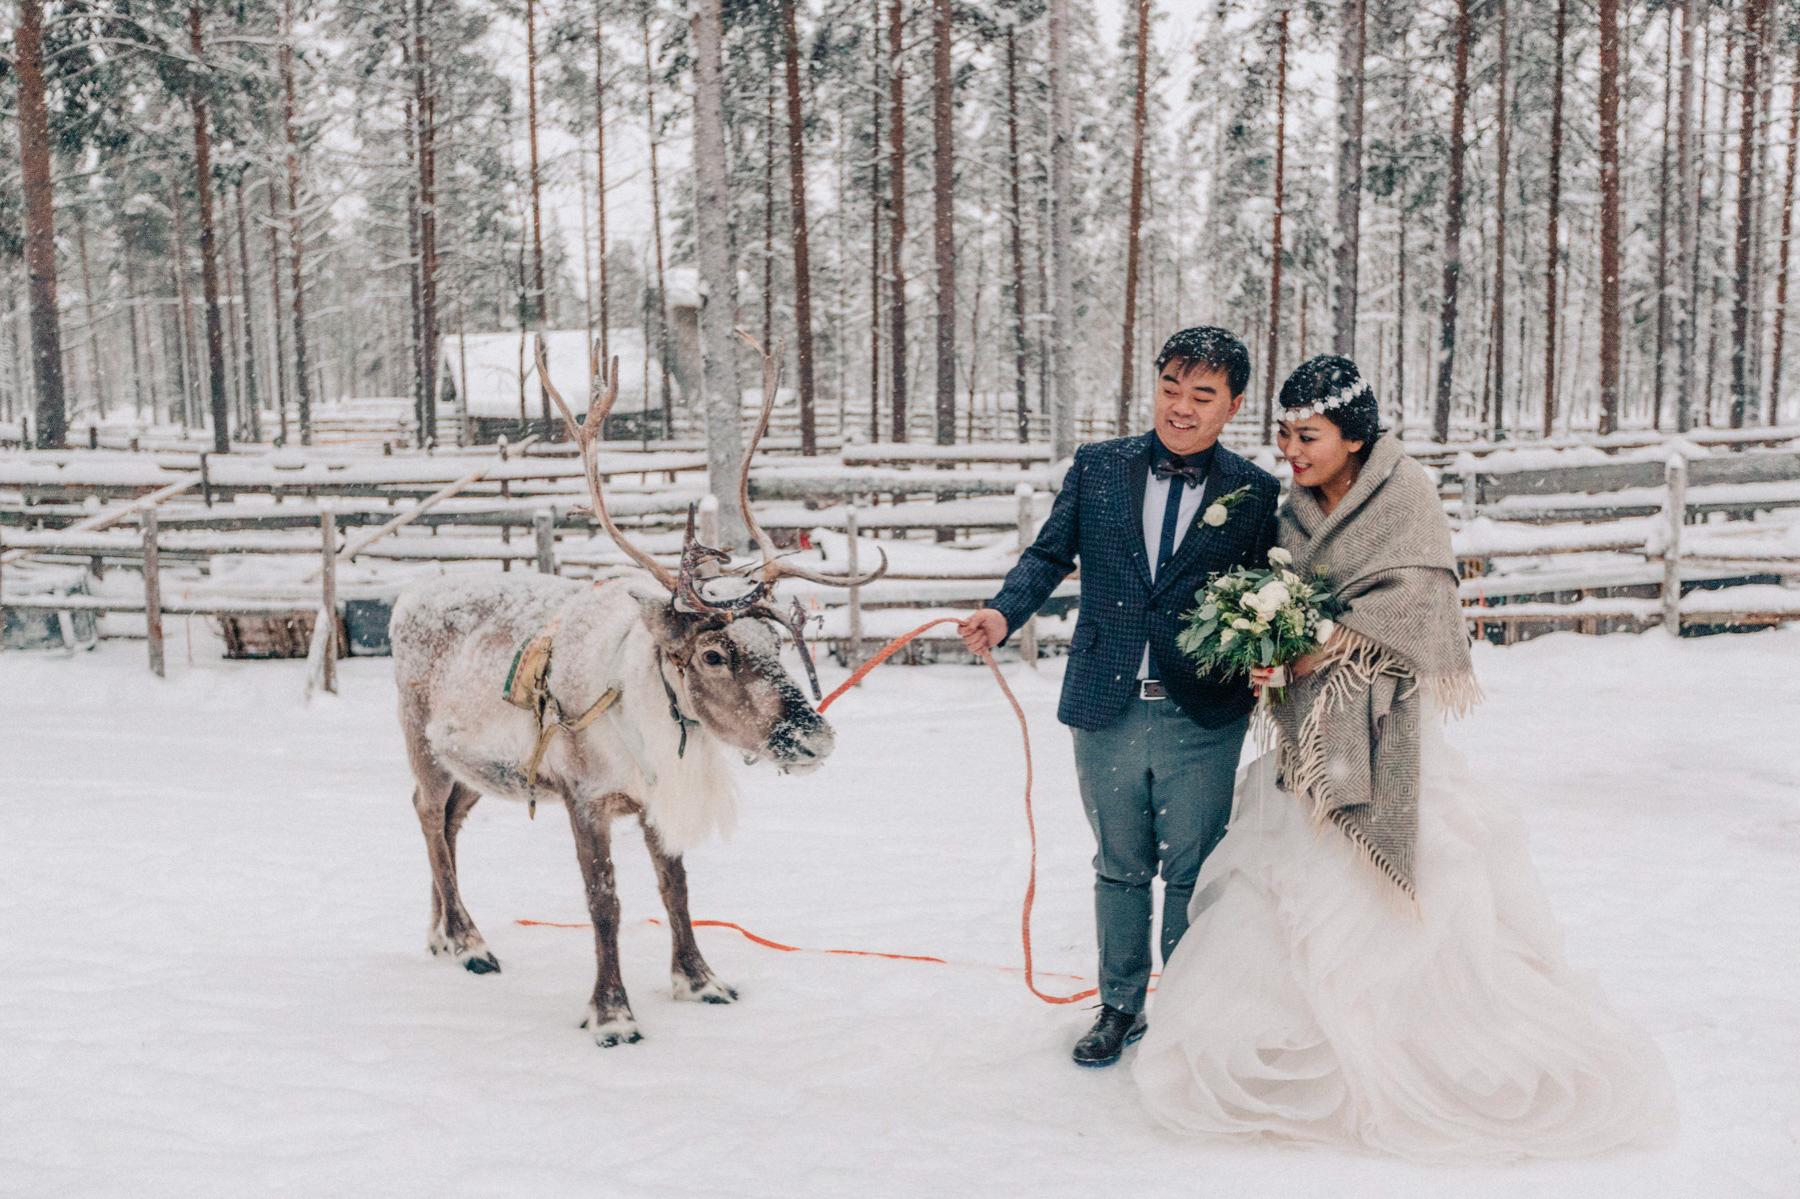 reindeer ride Lapland